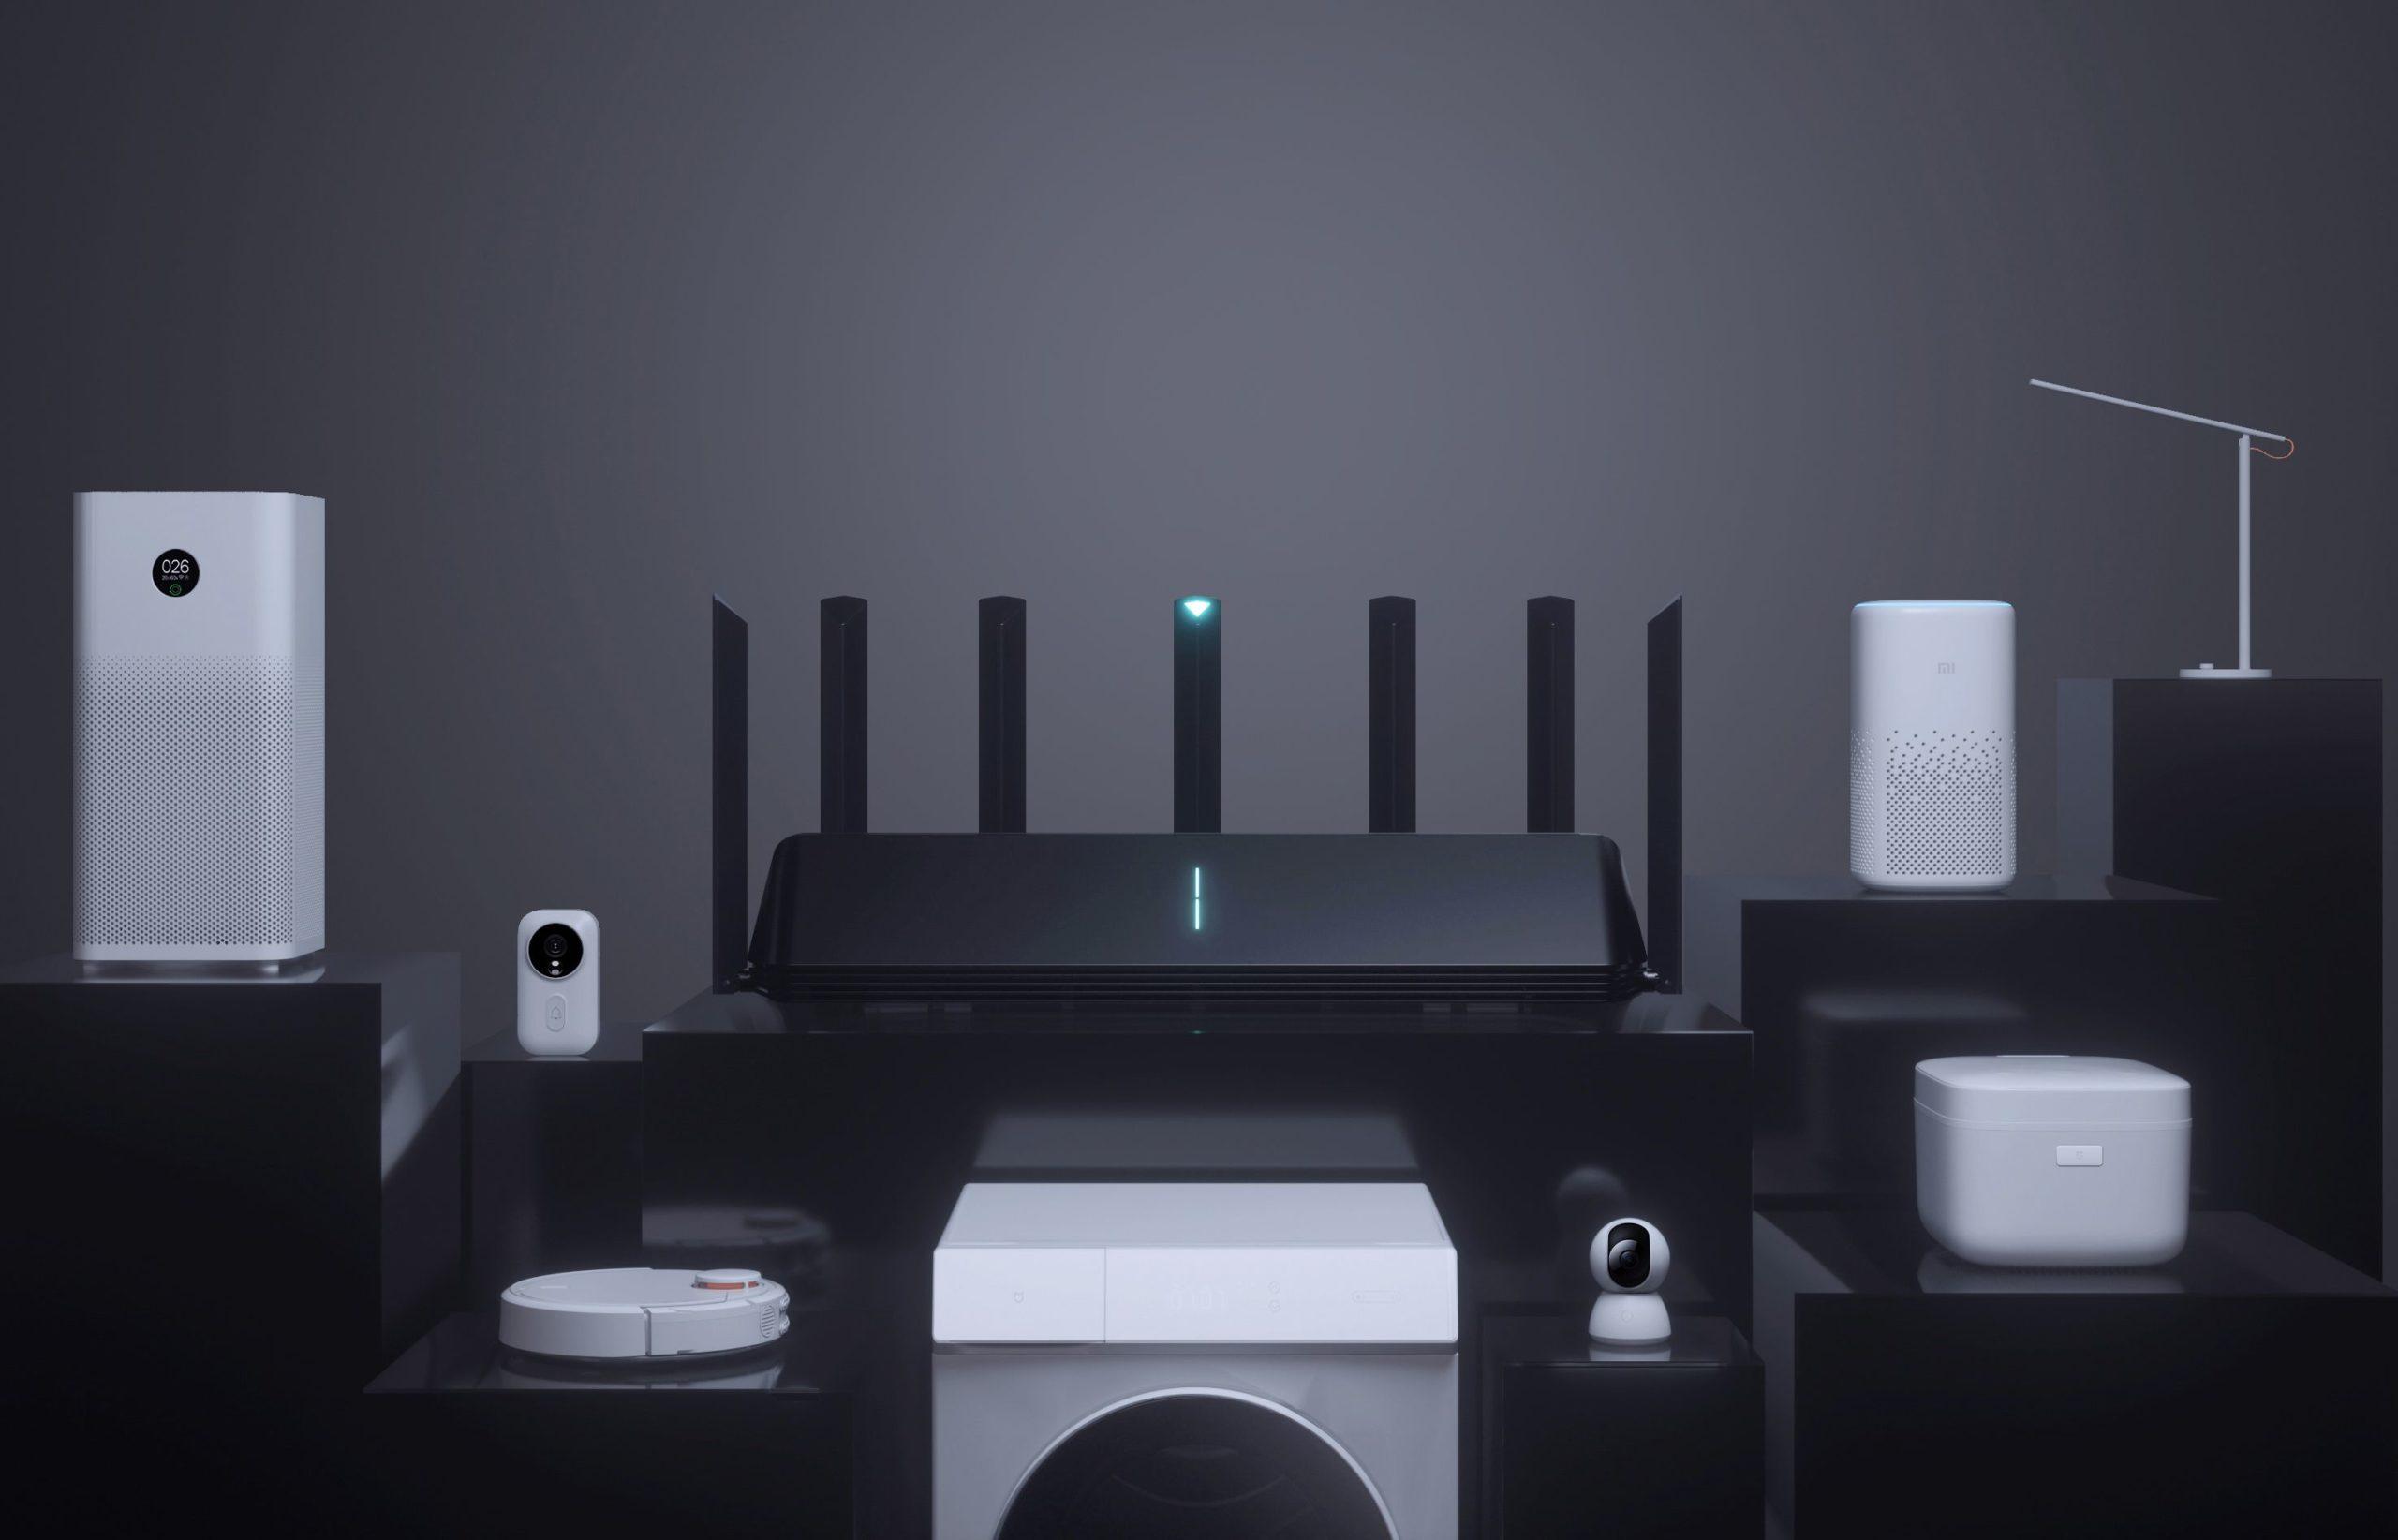 Mi Aiot Router Ax3600 03